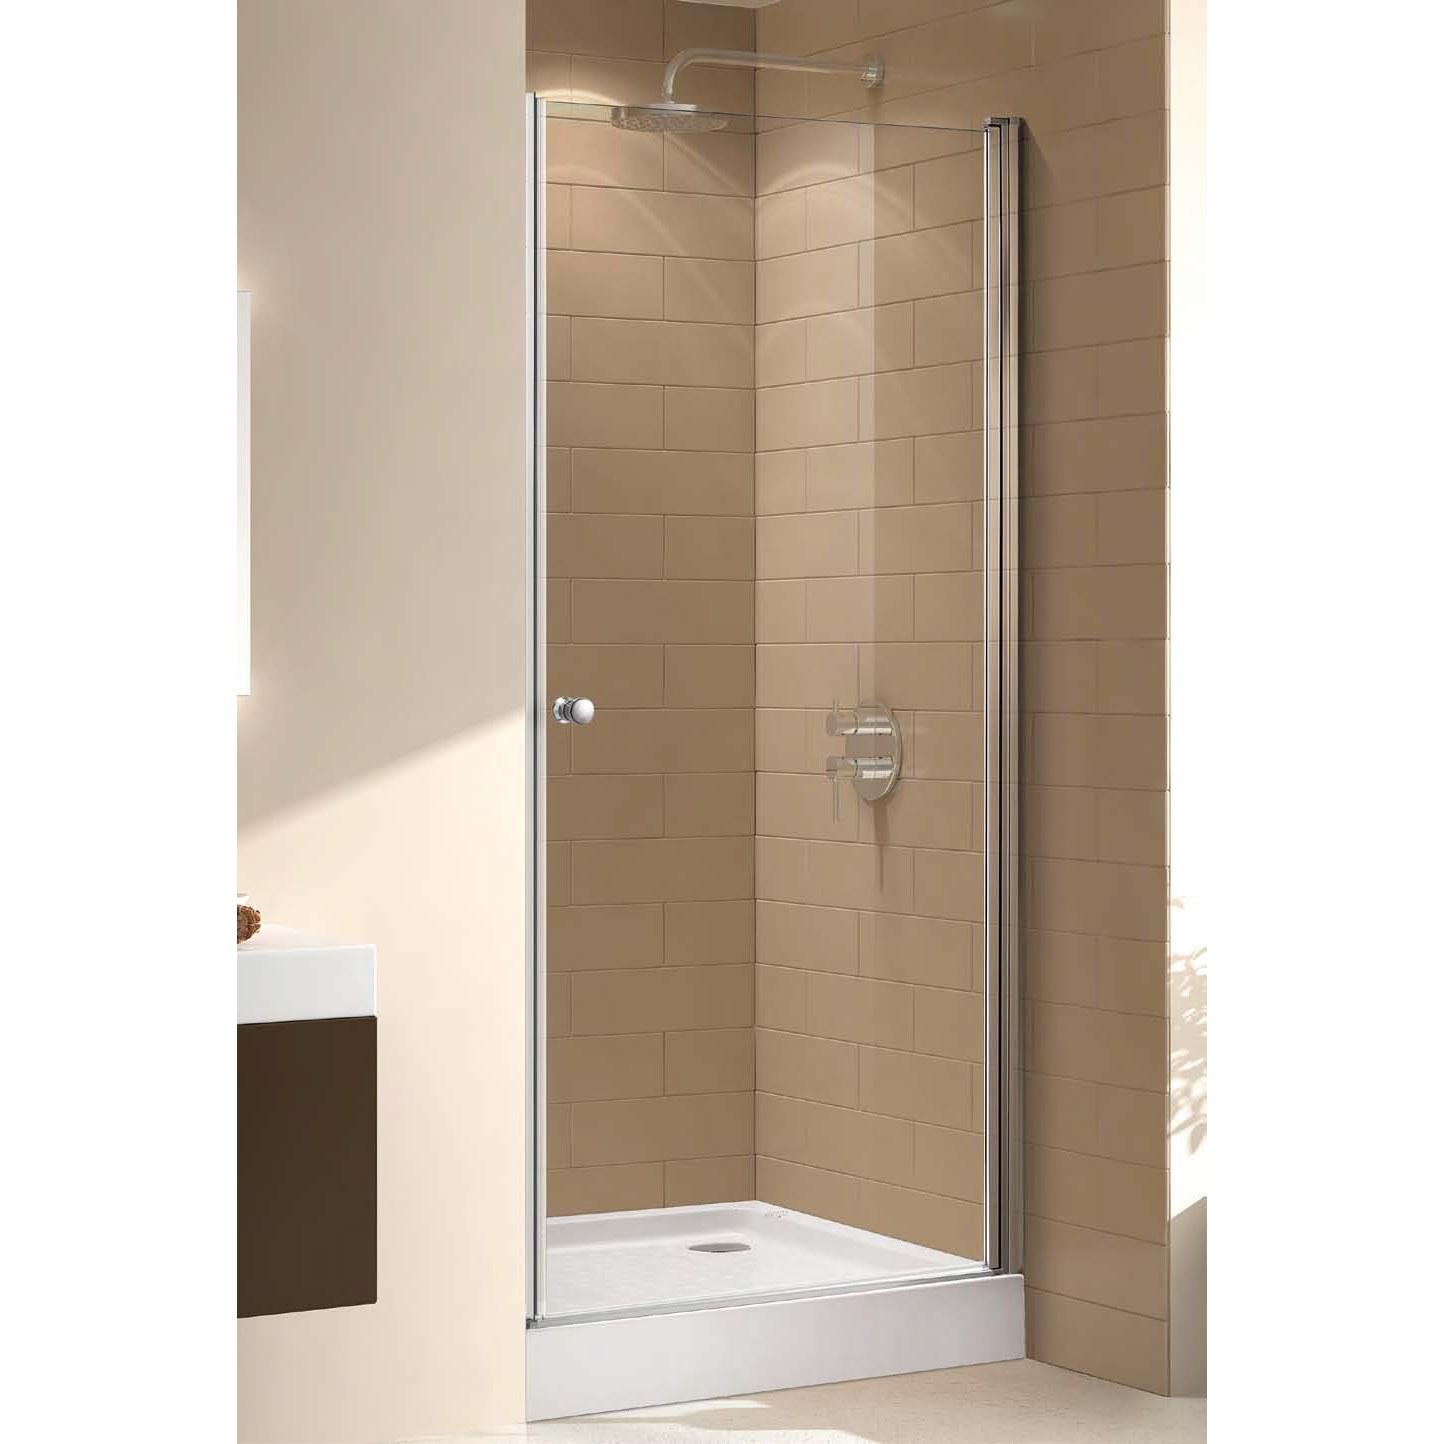 Дверь душевая Cezares ECO-B-1-90-C(P)-Cr, 90 см